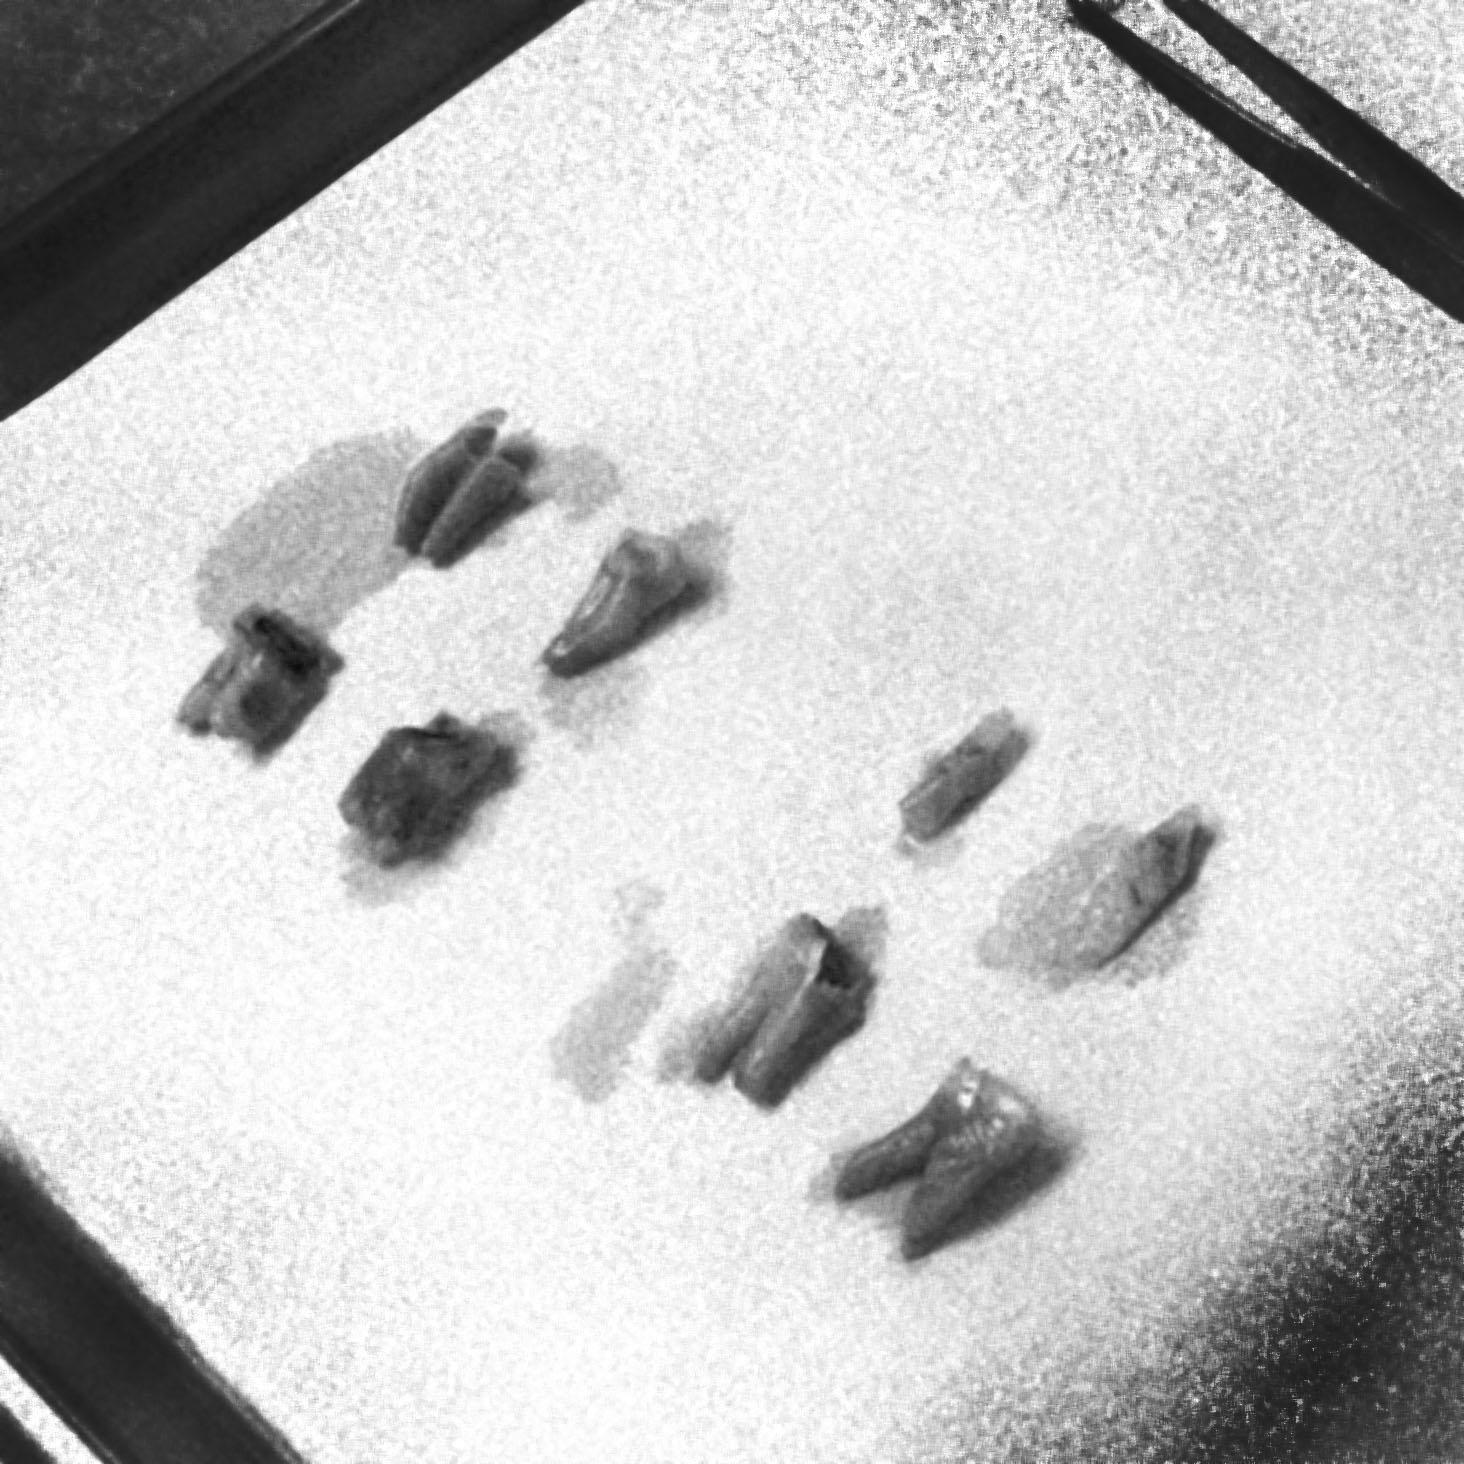 toothtray.jpg